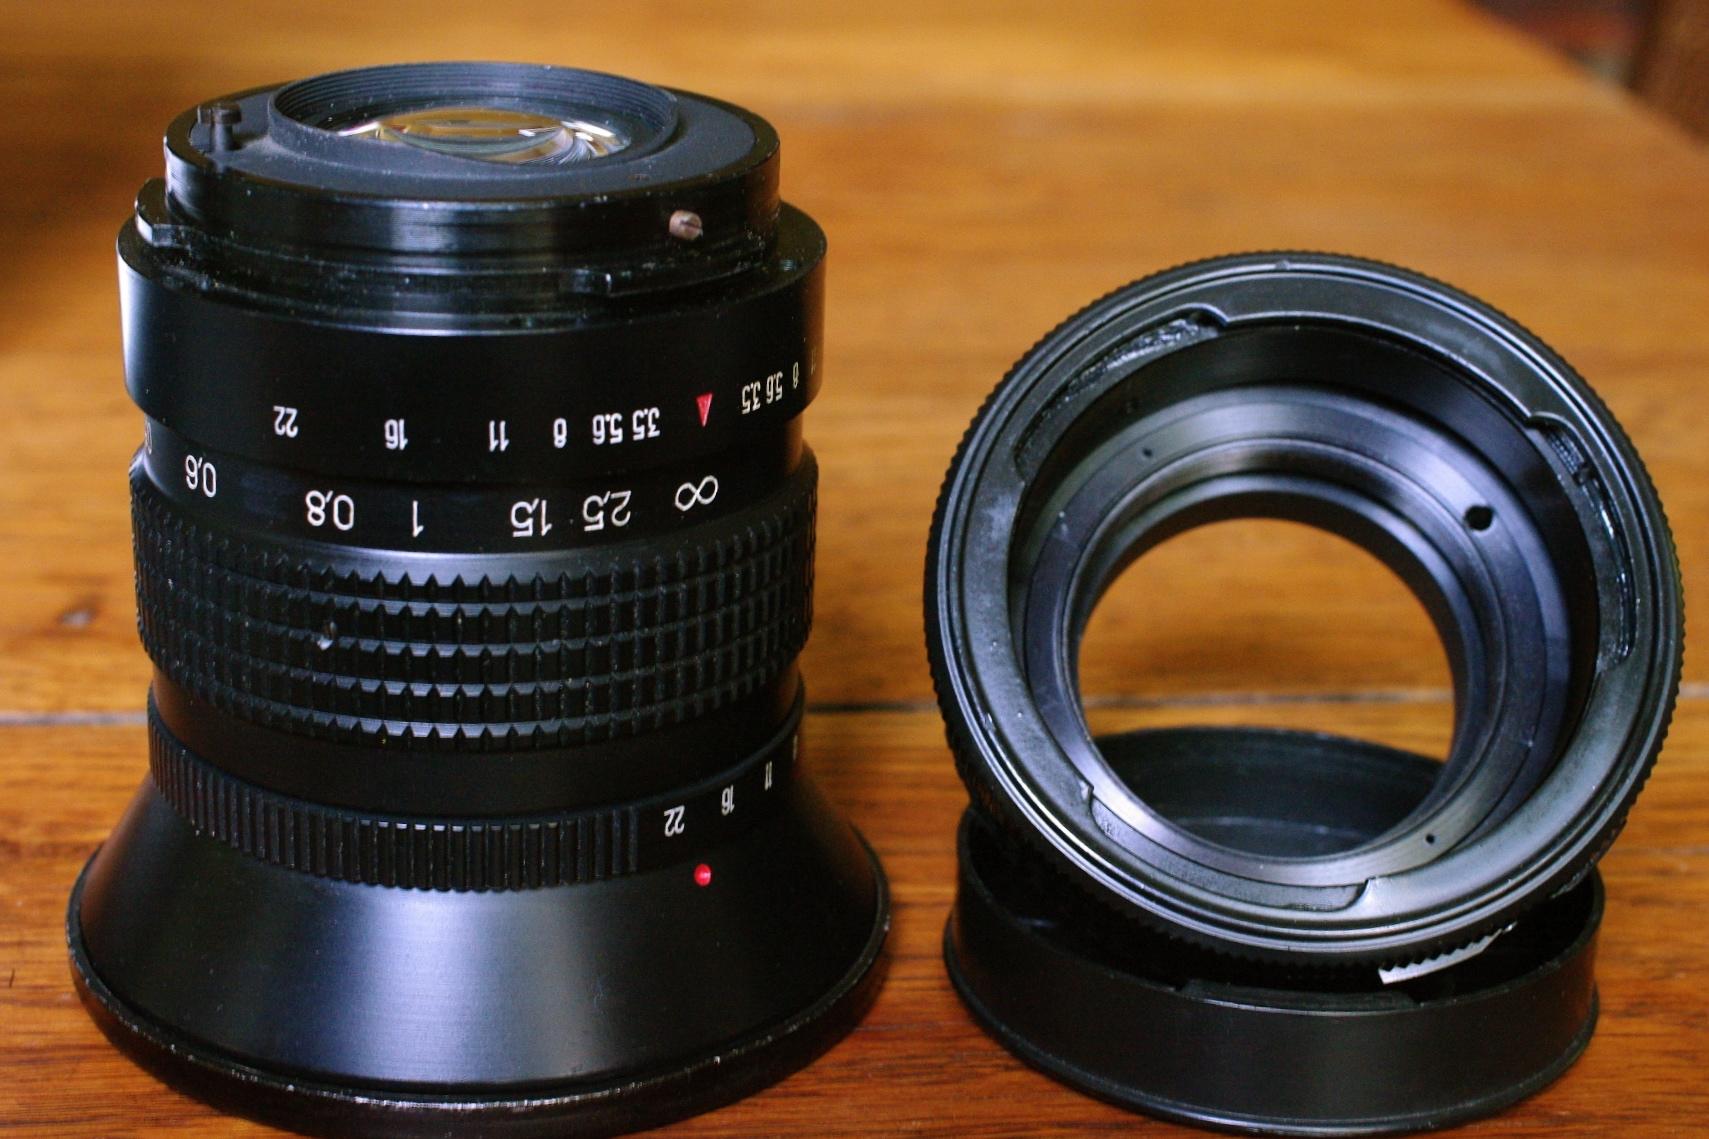 Hartblei Pentacon Six 6 P6 Kiev 60 88CM Lens to Contax 645 Adapter with Tilt 6/°